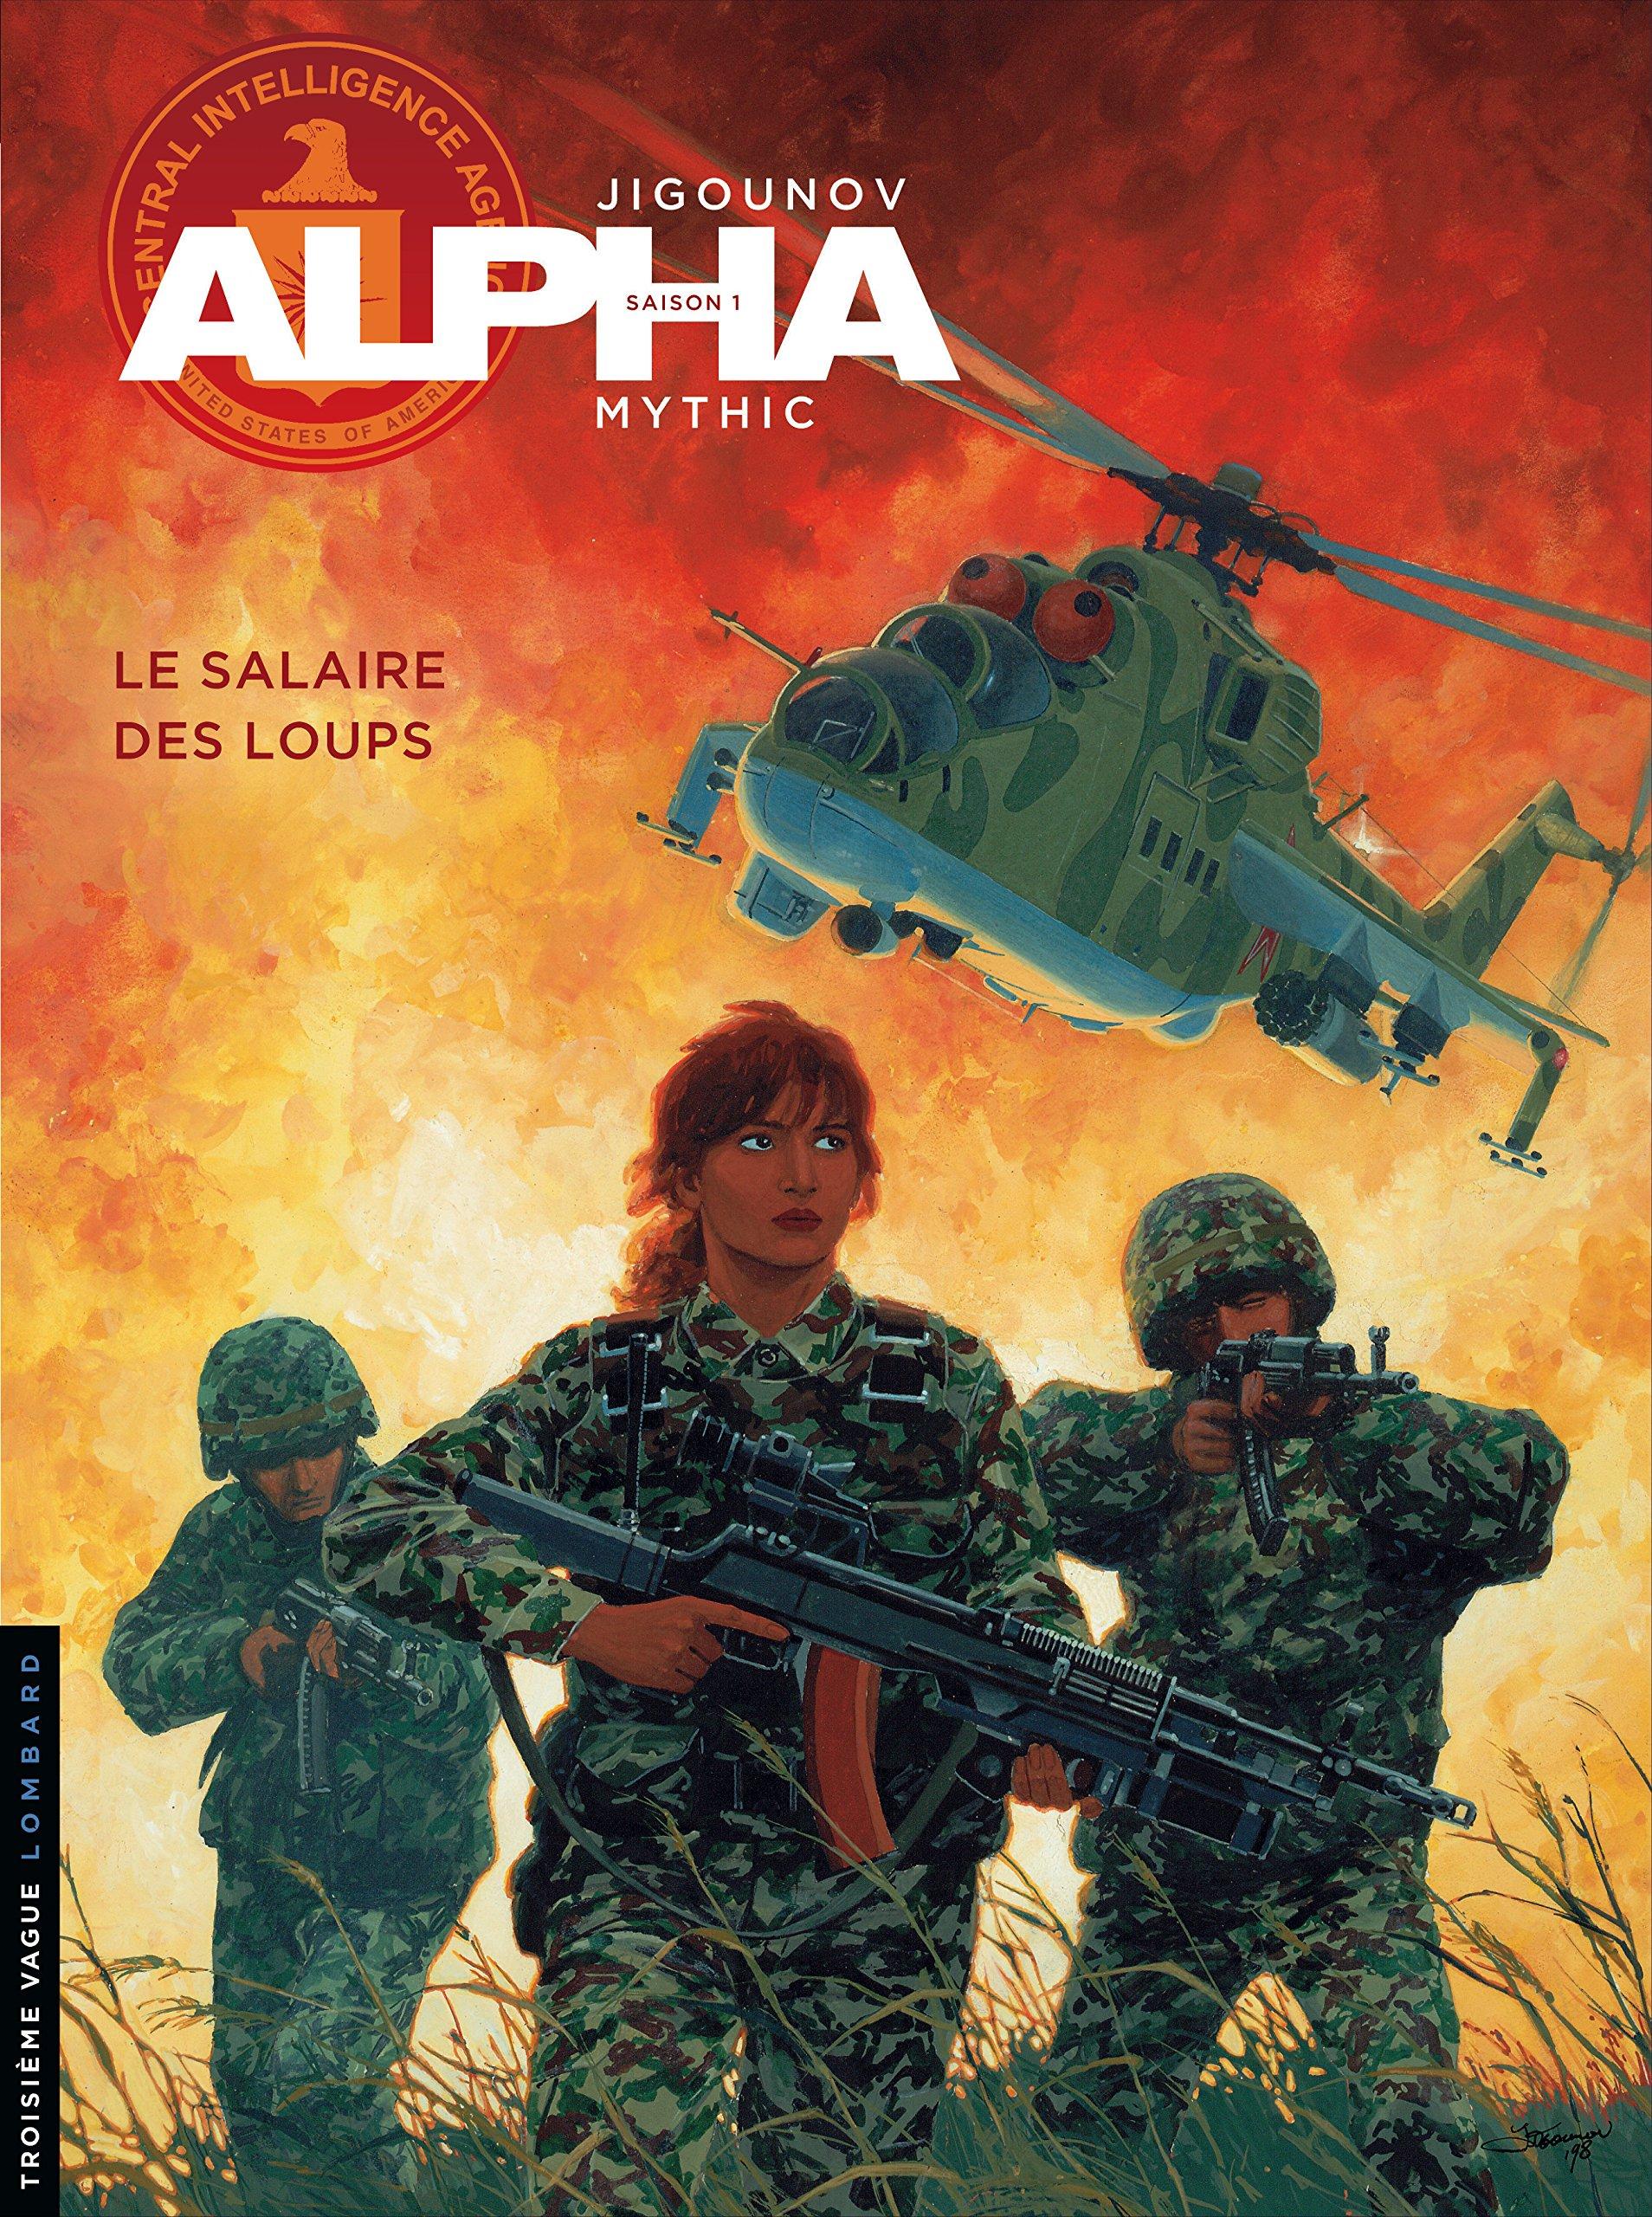 Alpha, tome 3 : Le salaire des loups Album – 3 mars 1999 Youri Jigounov Mythic Le Lombard 2803614308